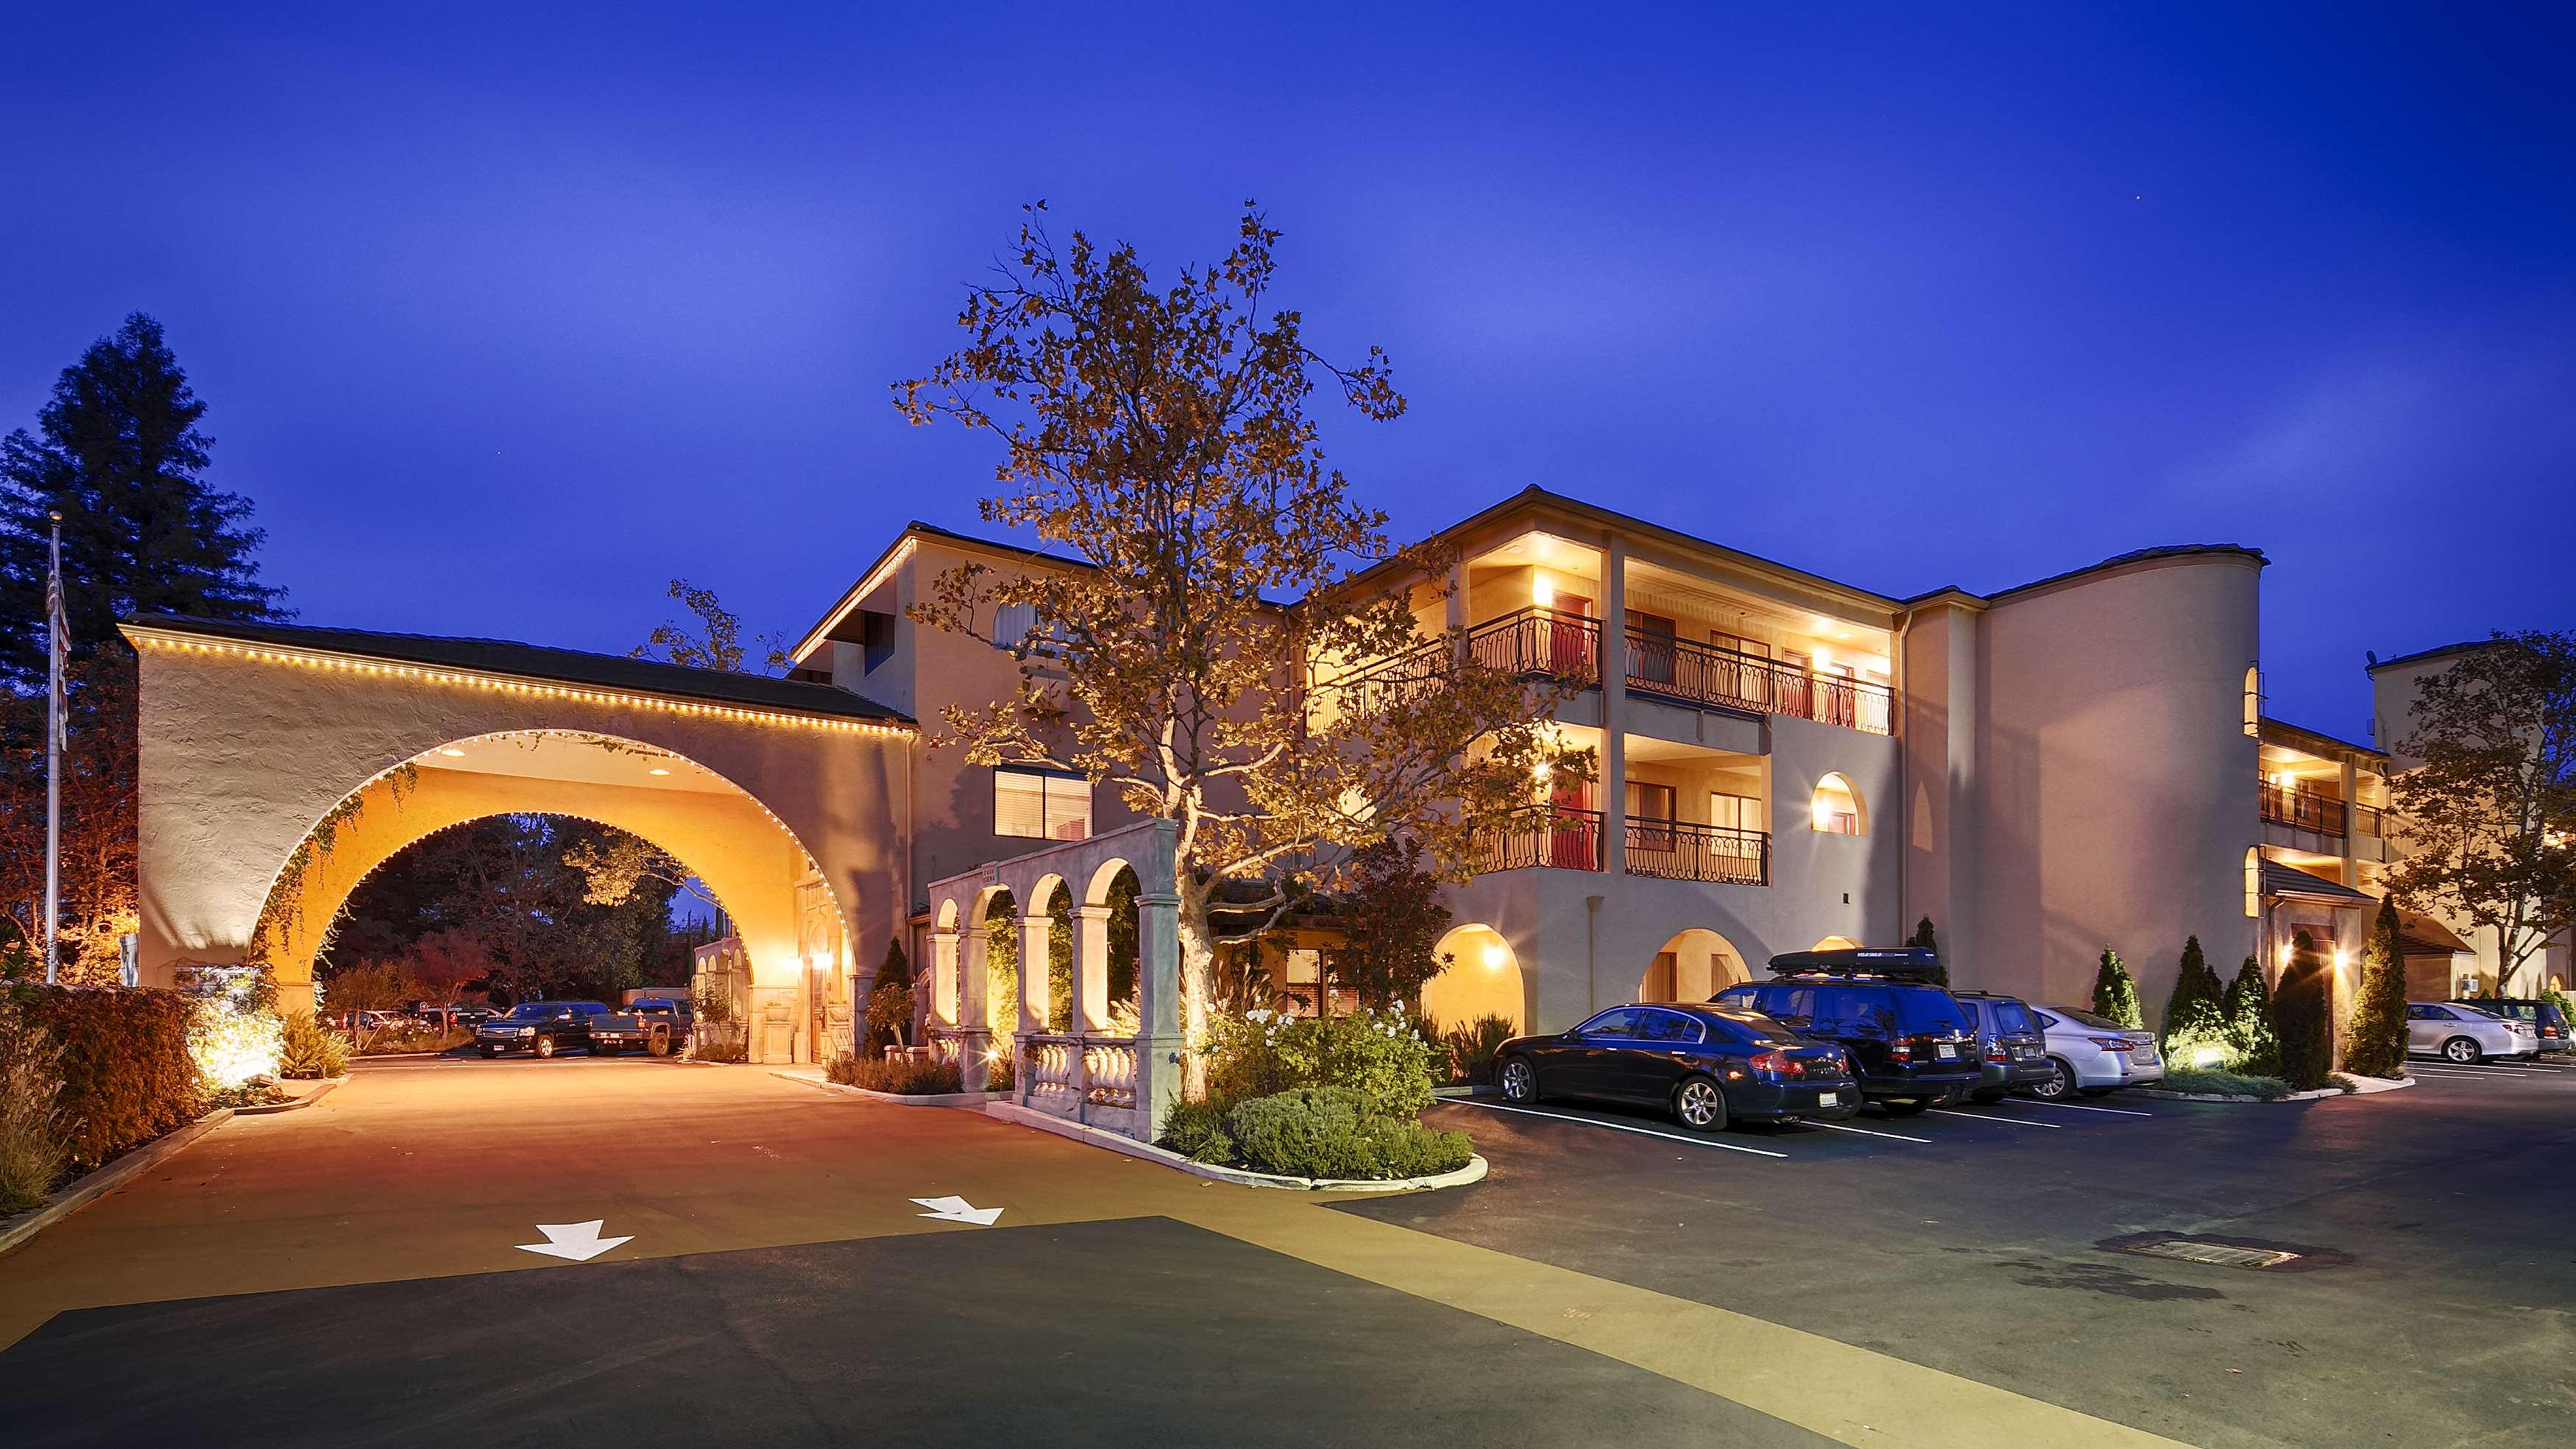 Casino in healdsburg california